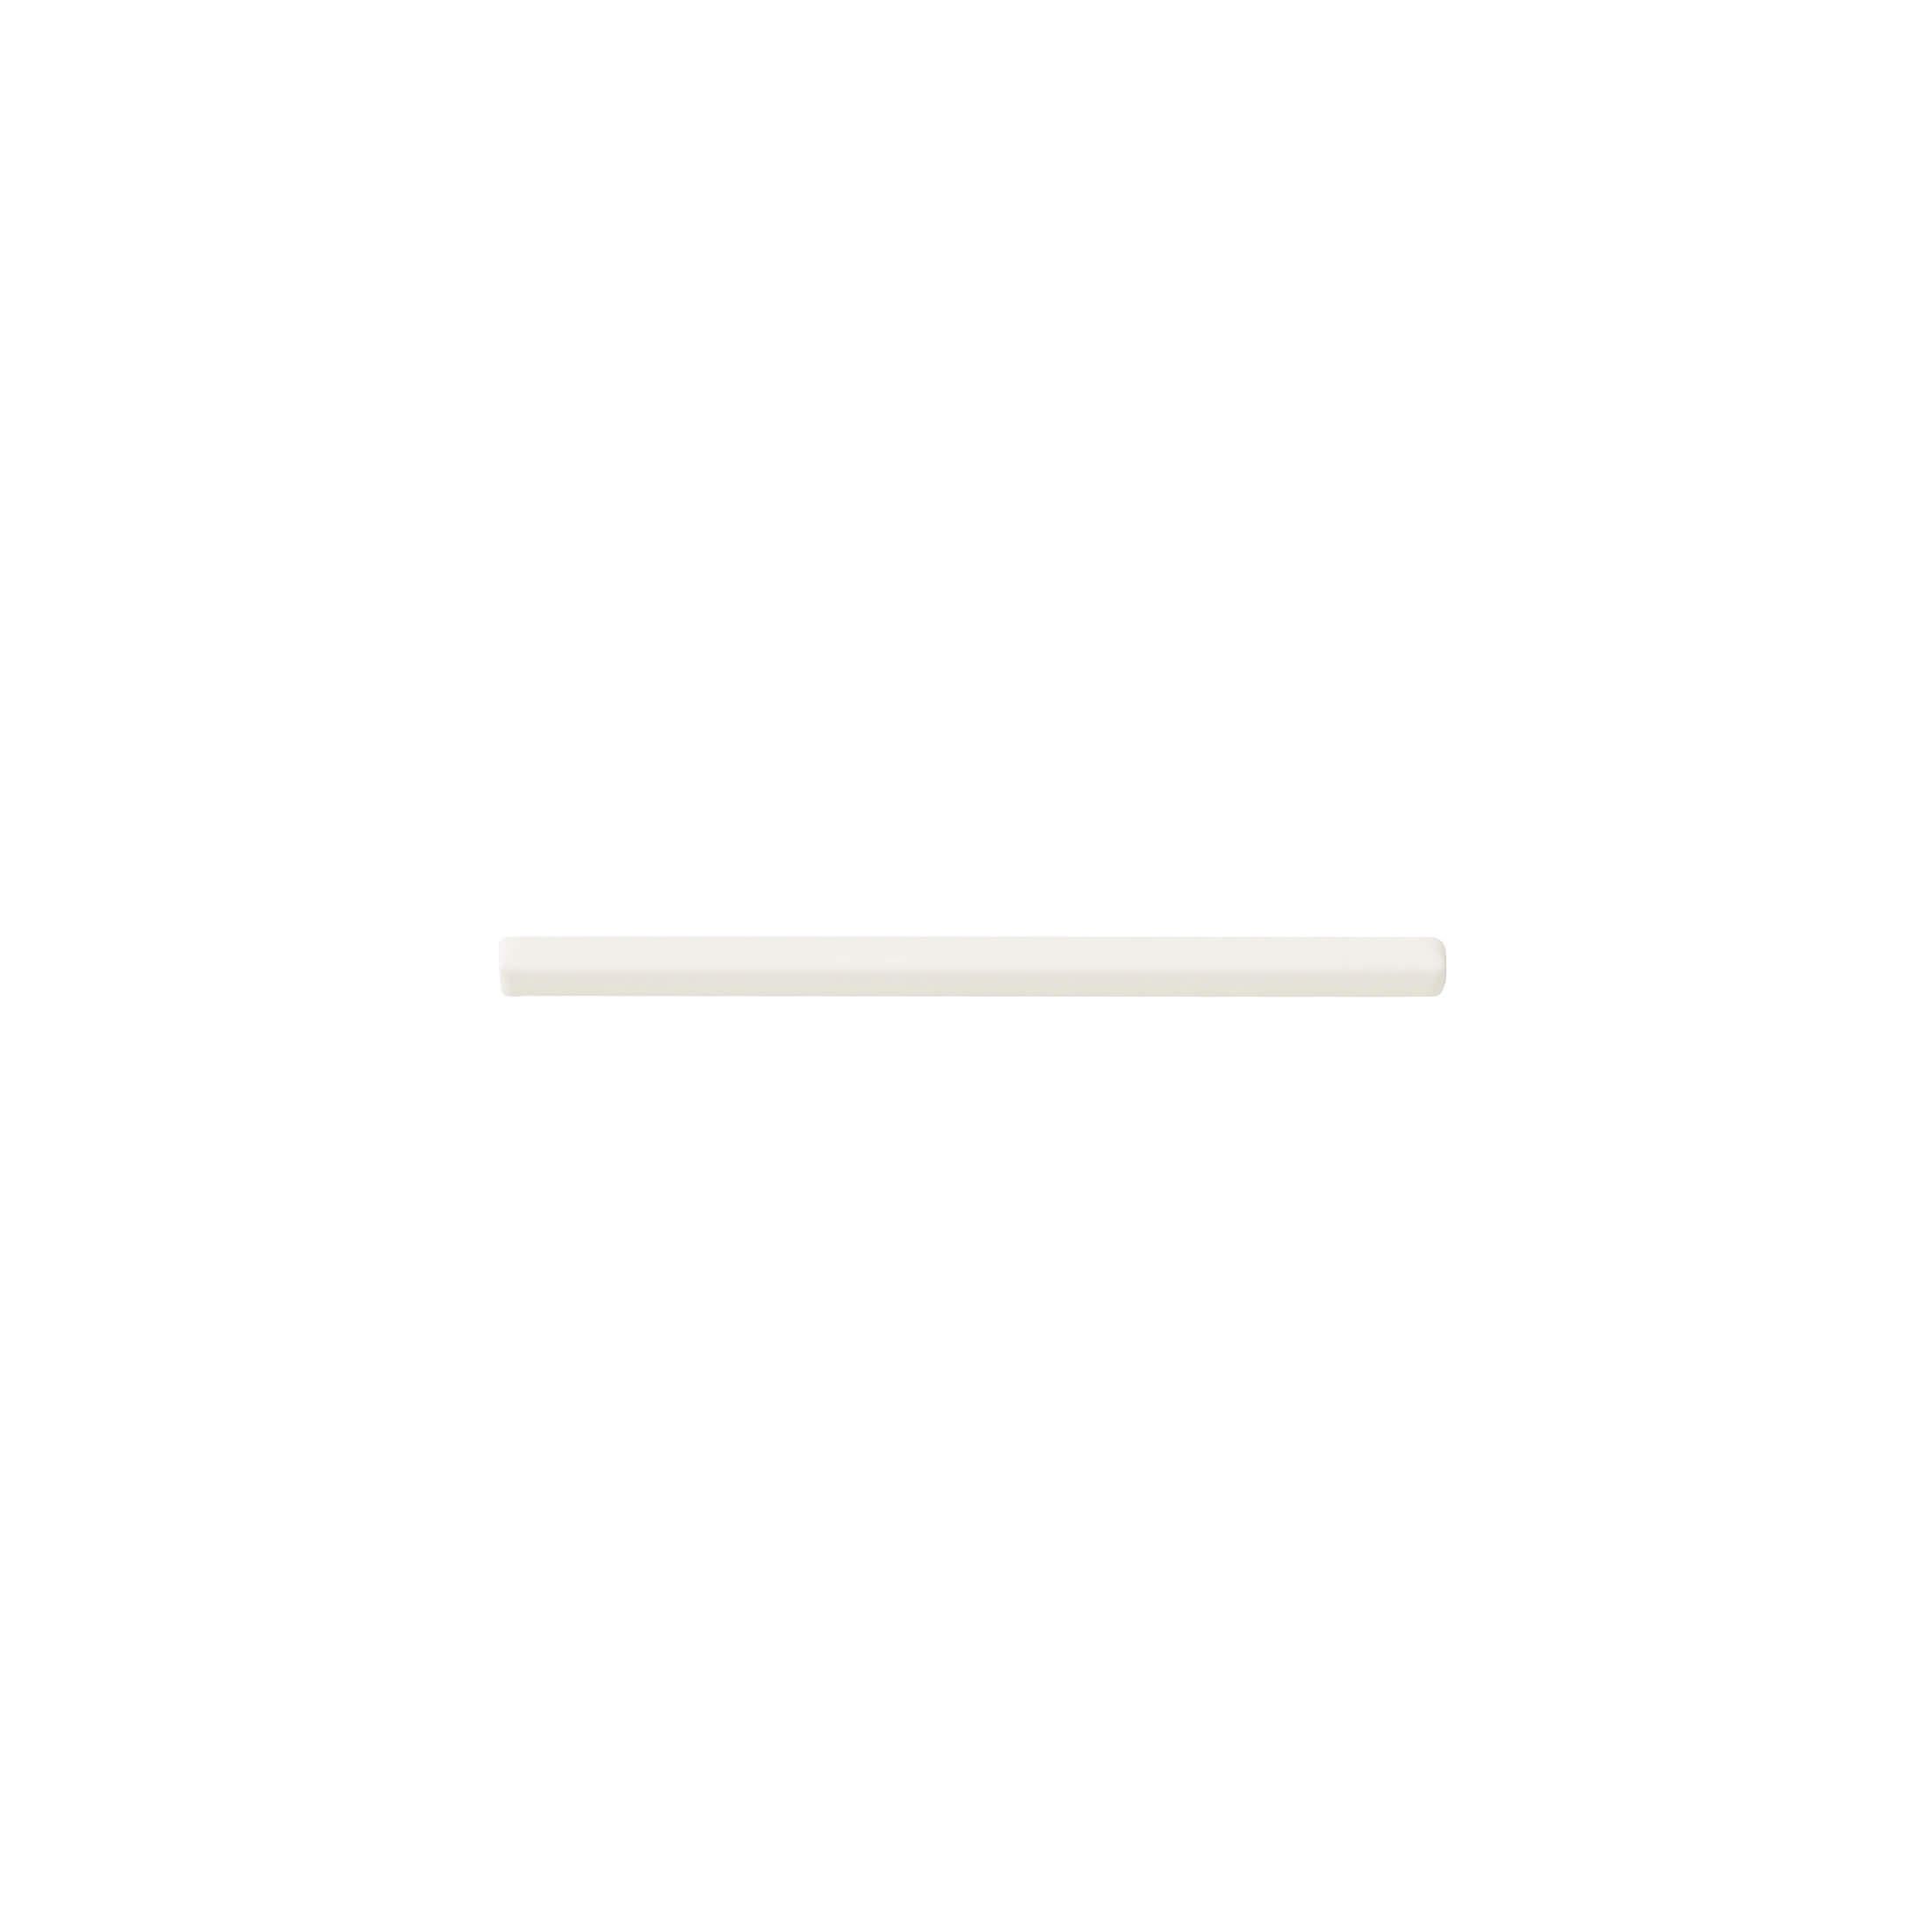 ADNE5577 - BULLNOSE TRIM - 0.85 cm X 15 cm